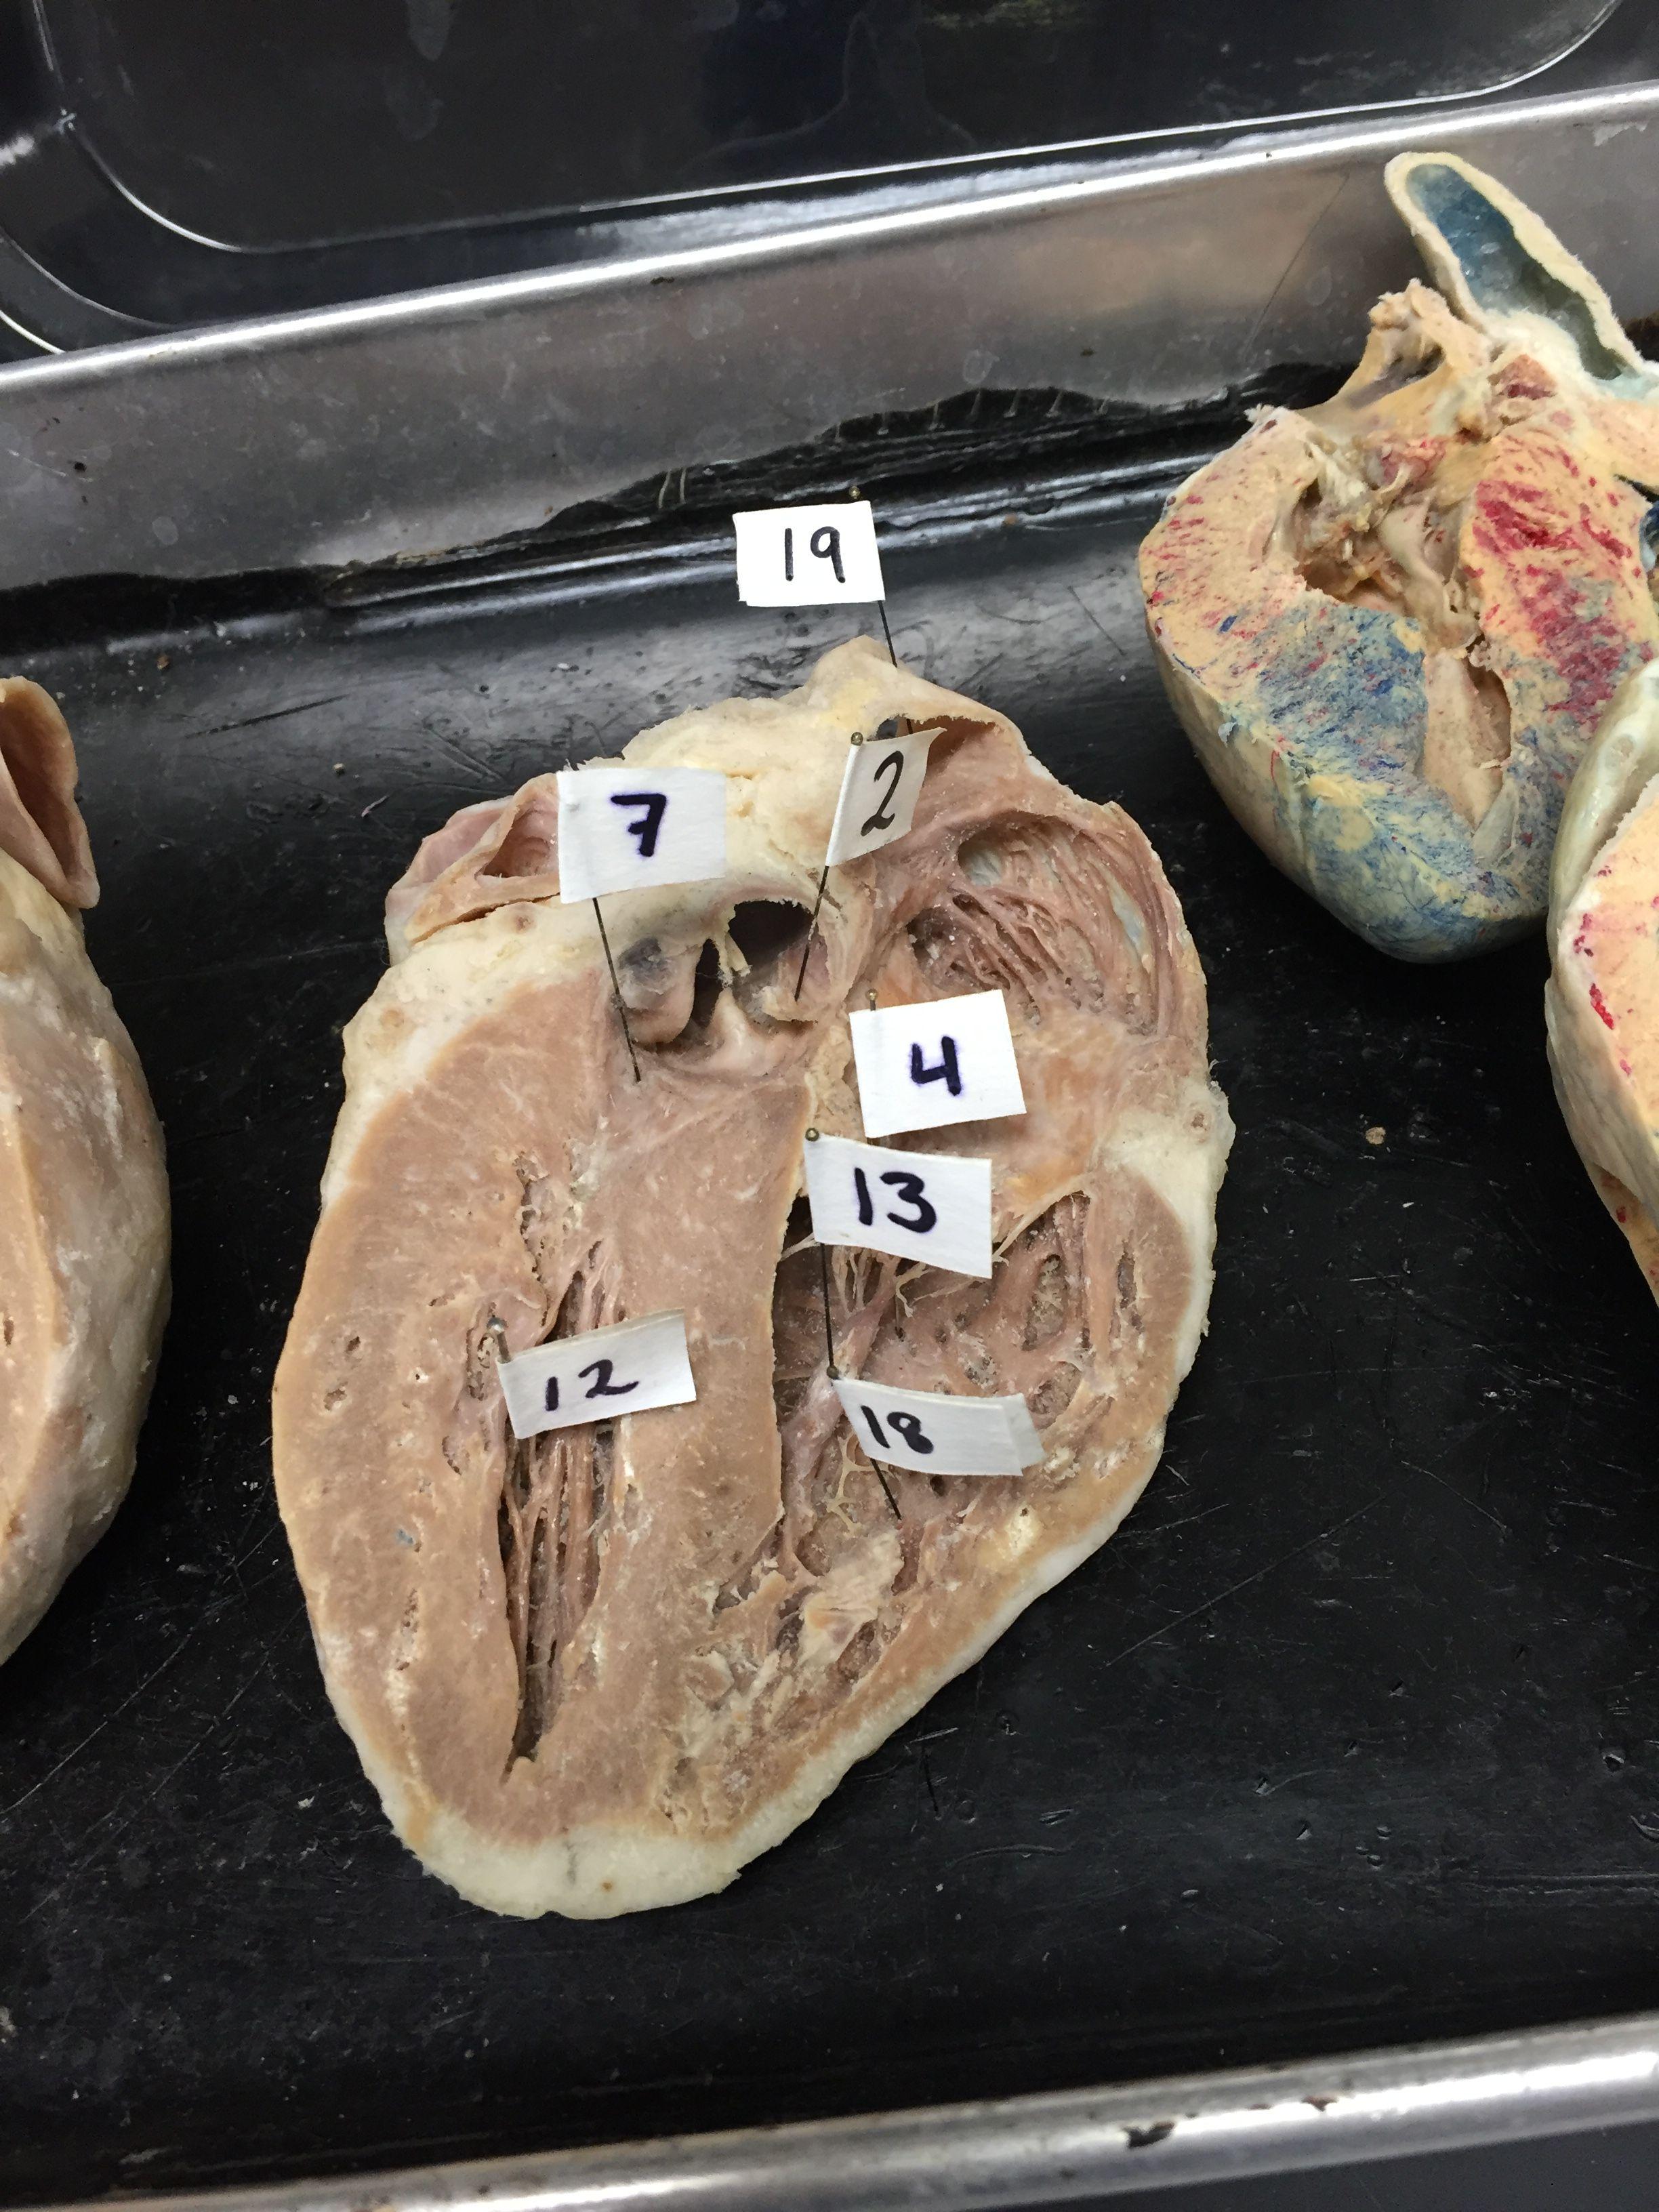 Sheeps Heart 1. Arch of Aorta 2. Aortic Semilunar Valve 3 ...